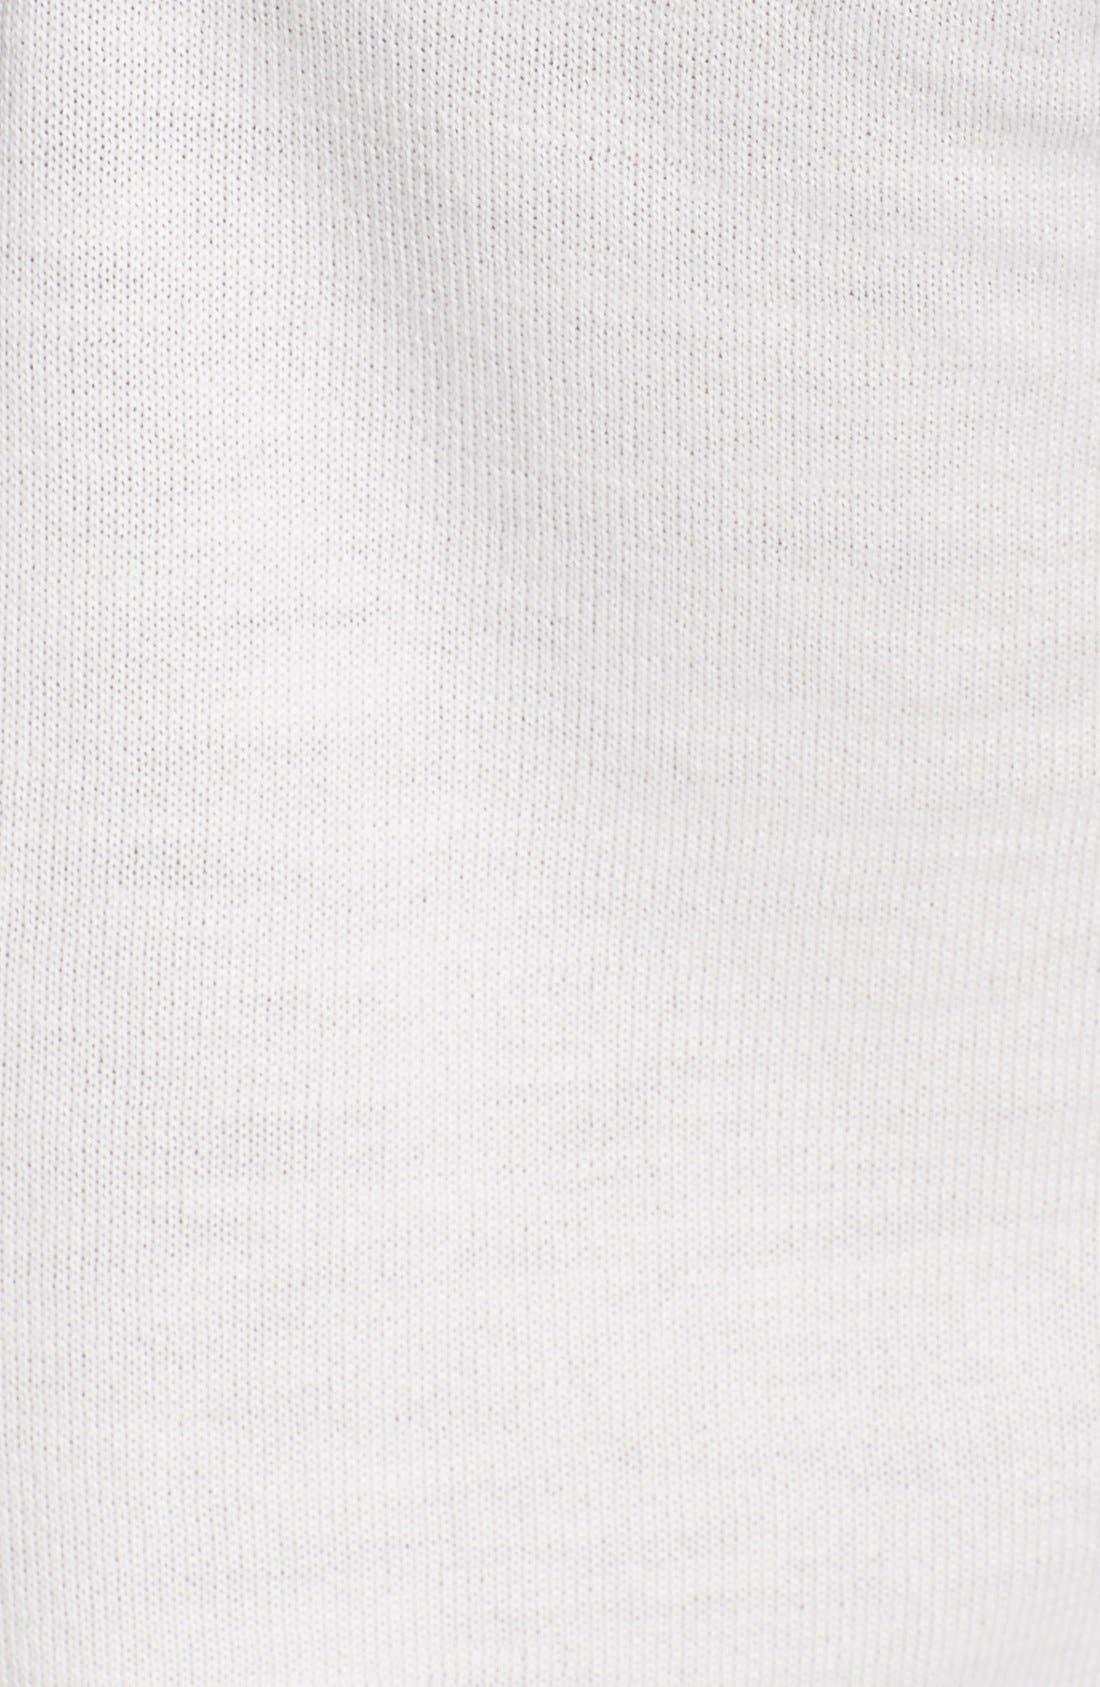 Alternate Image 3  - Burberry Brit Check Pattern Wool Sweater